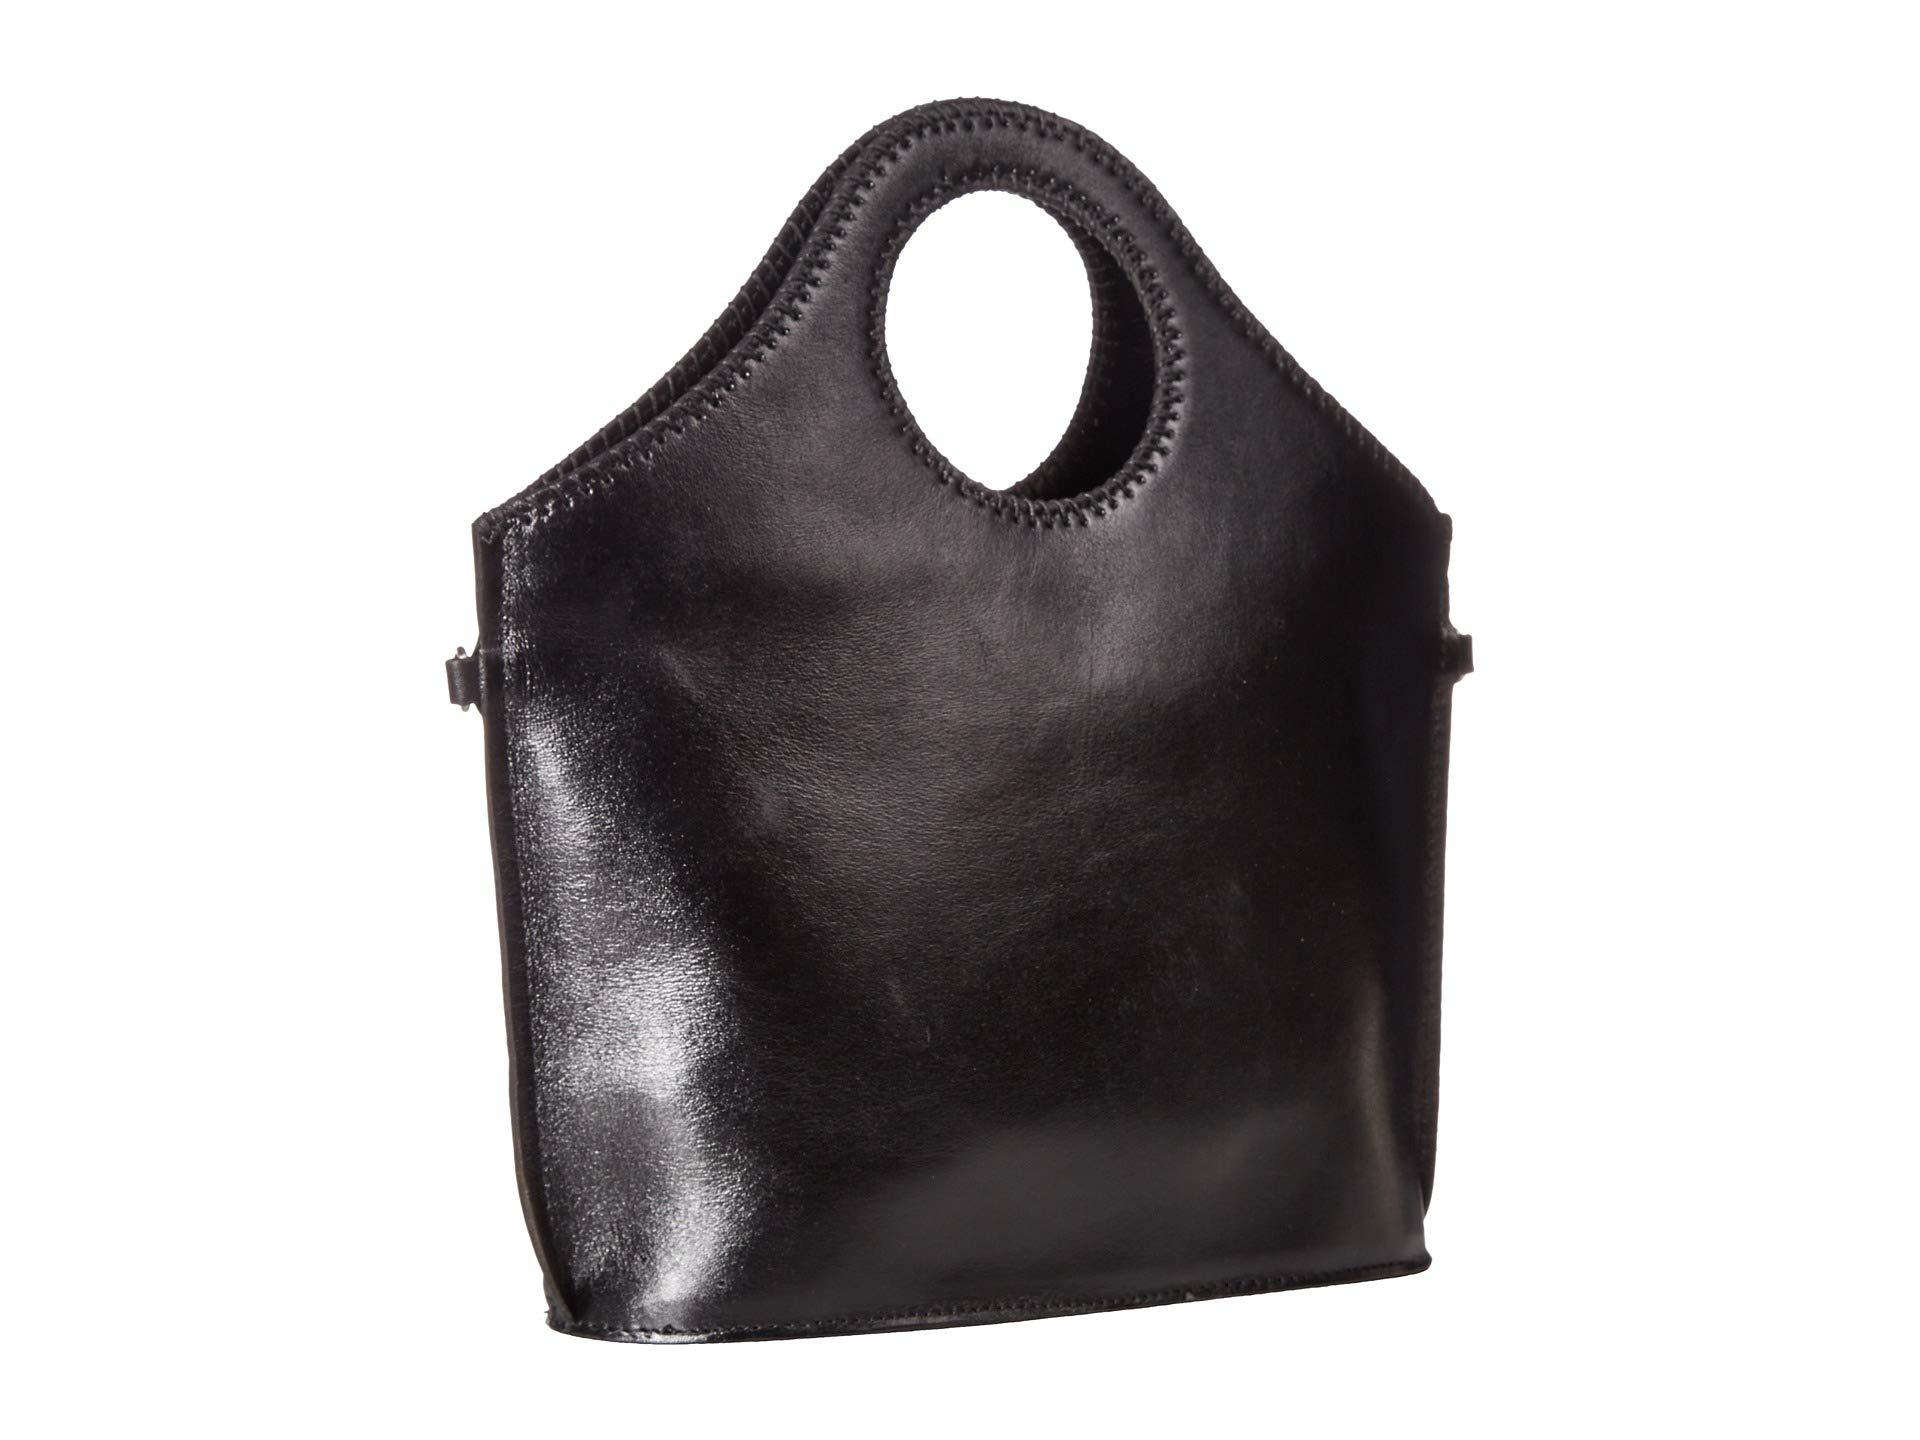 9c490720f7 Lyst - Patricia Nash Tooled Moretto (tan) Tote Handbags in Black ...